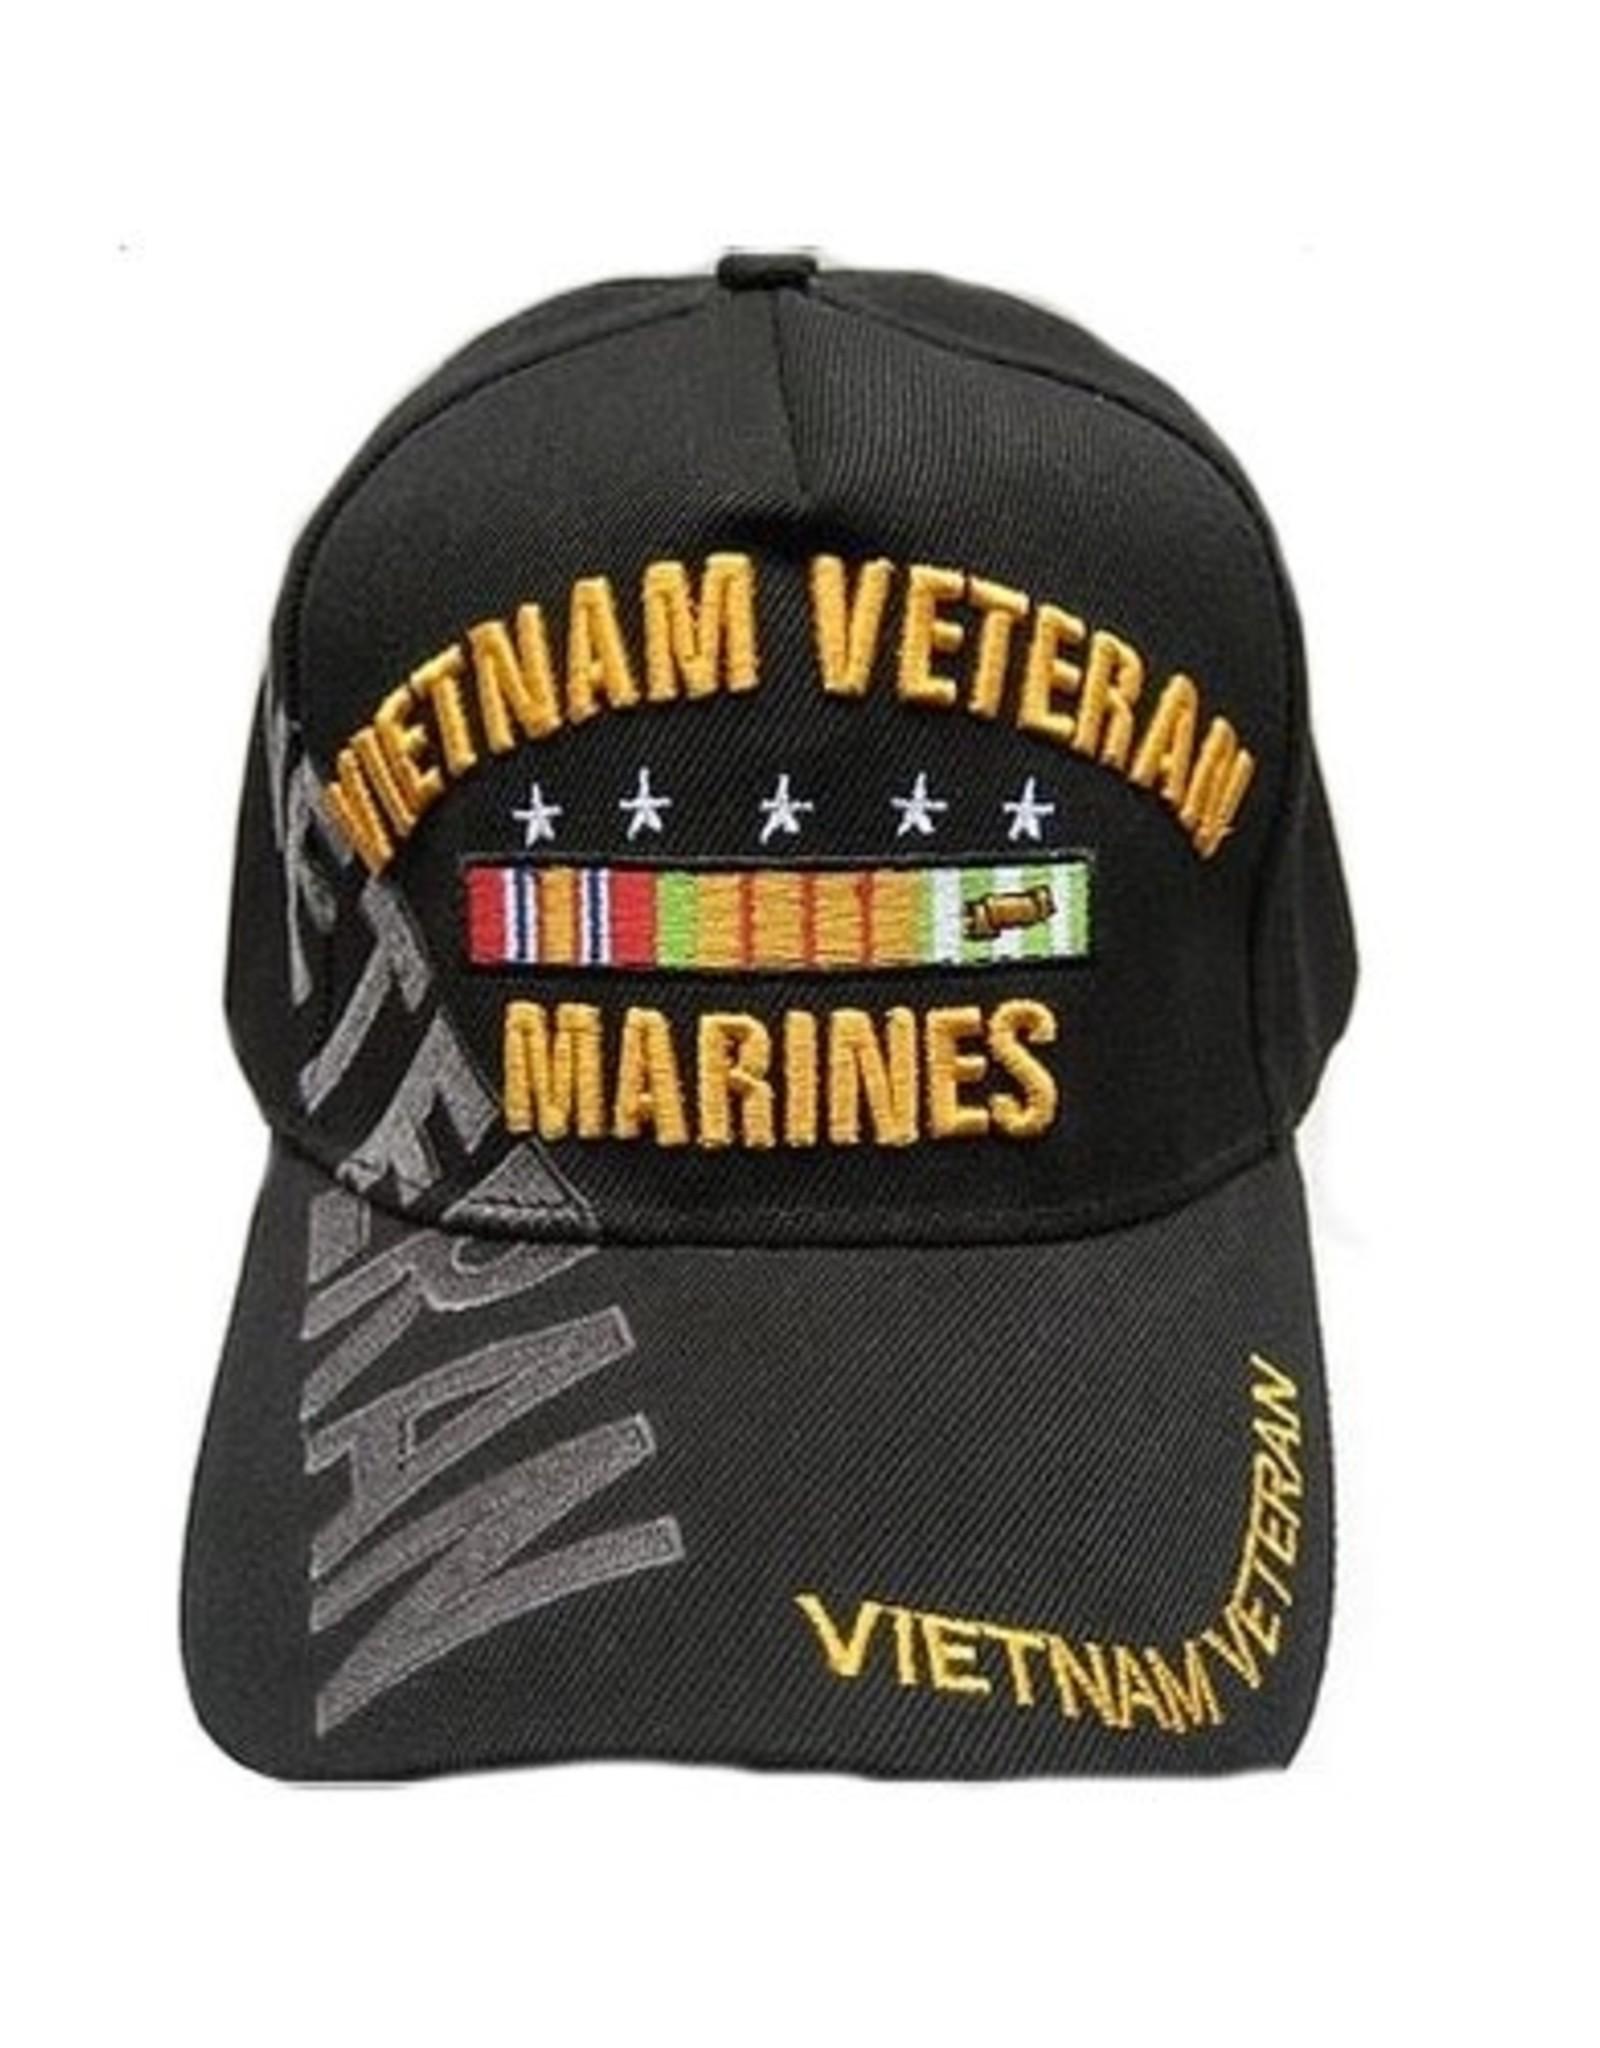 MidMil Vietnam Veteran Marines Hat with Over Shadow Black